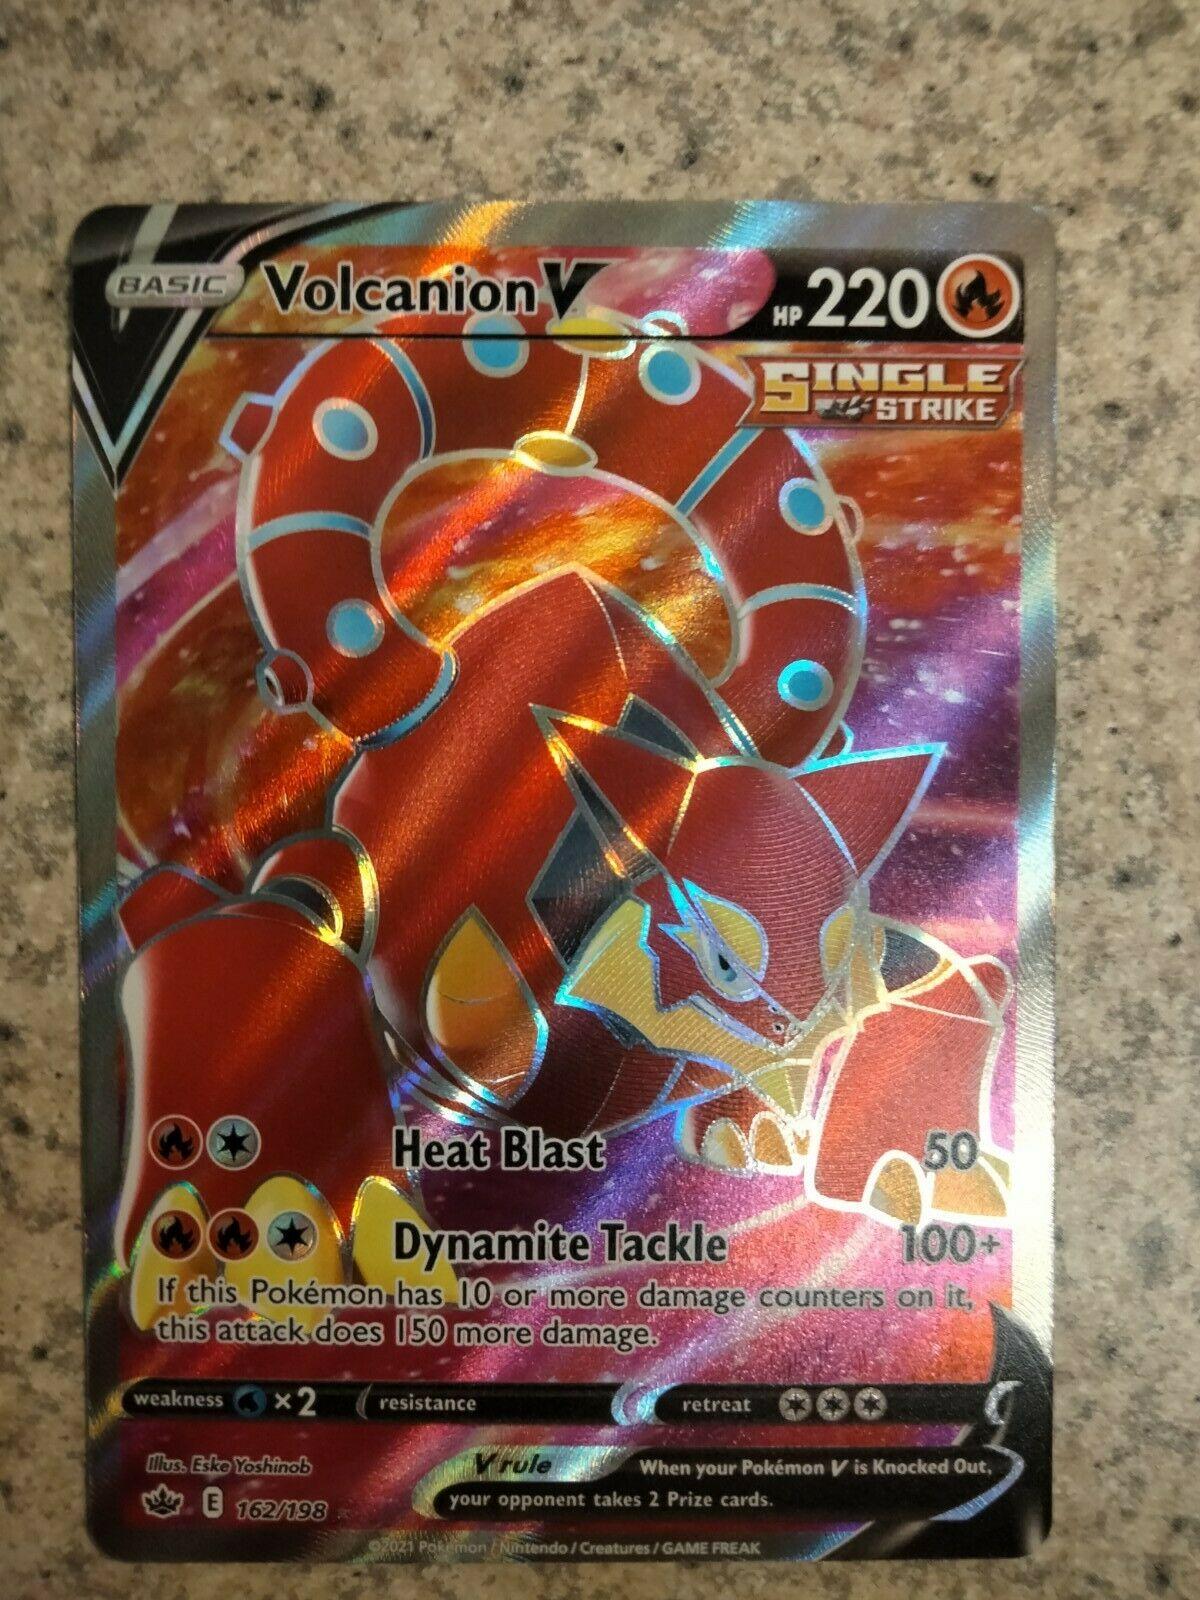 Volcanion V 162/198 ULTRA RARE Holo Foil - Pokemon Chilling Reign near mint